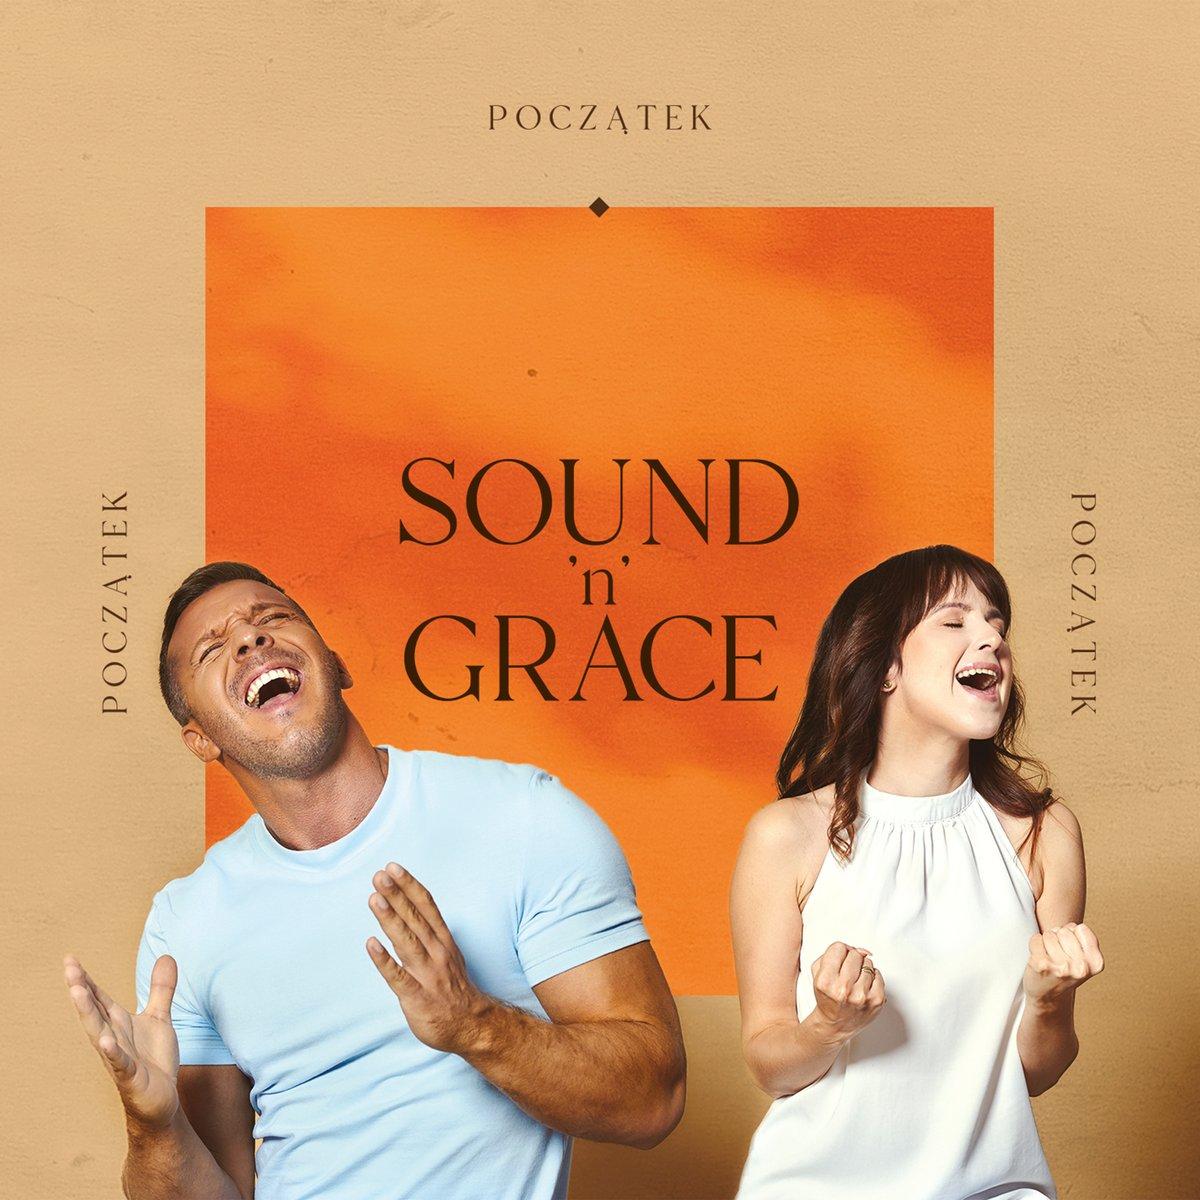 SOUND'N'GRACE - Początek